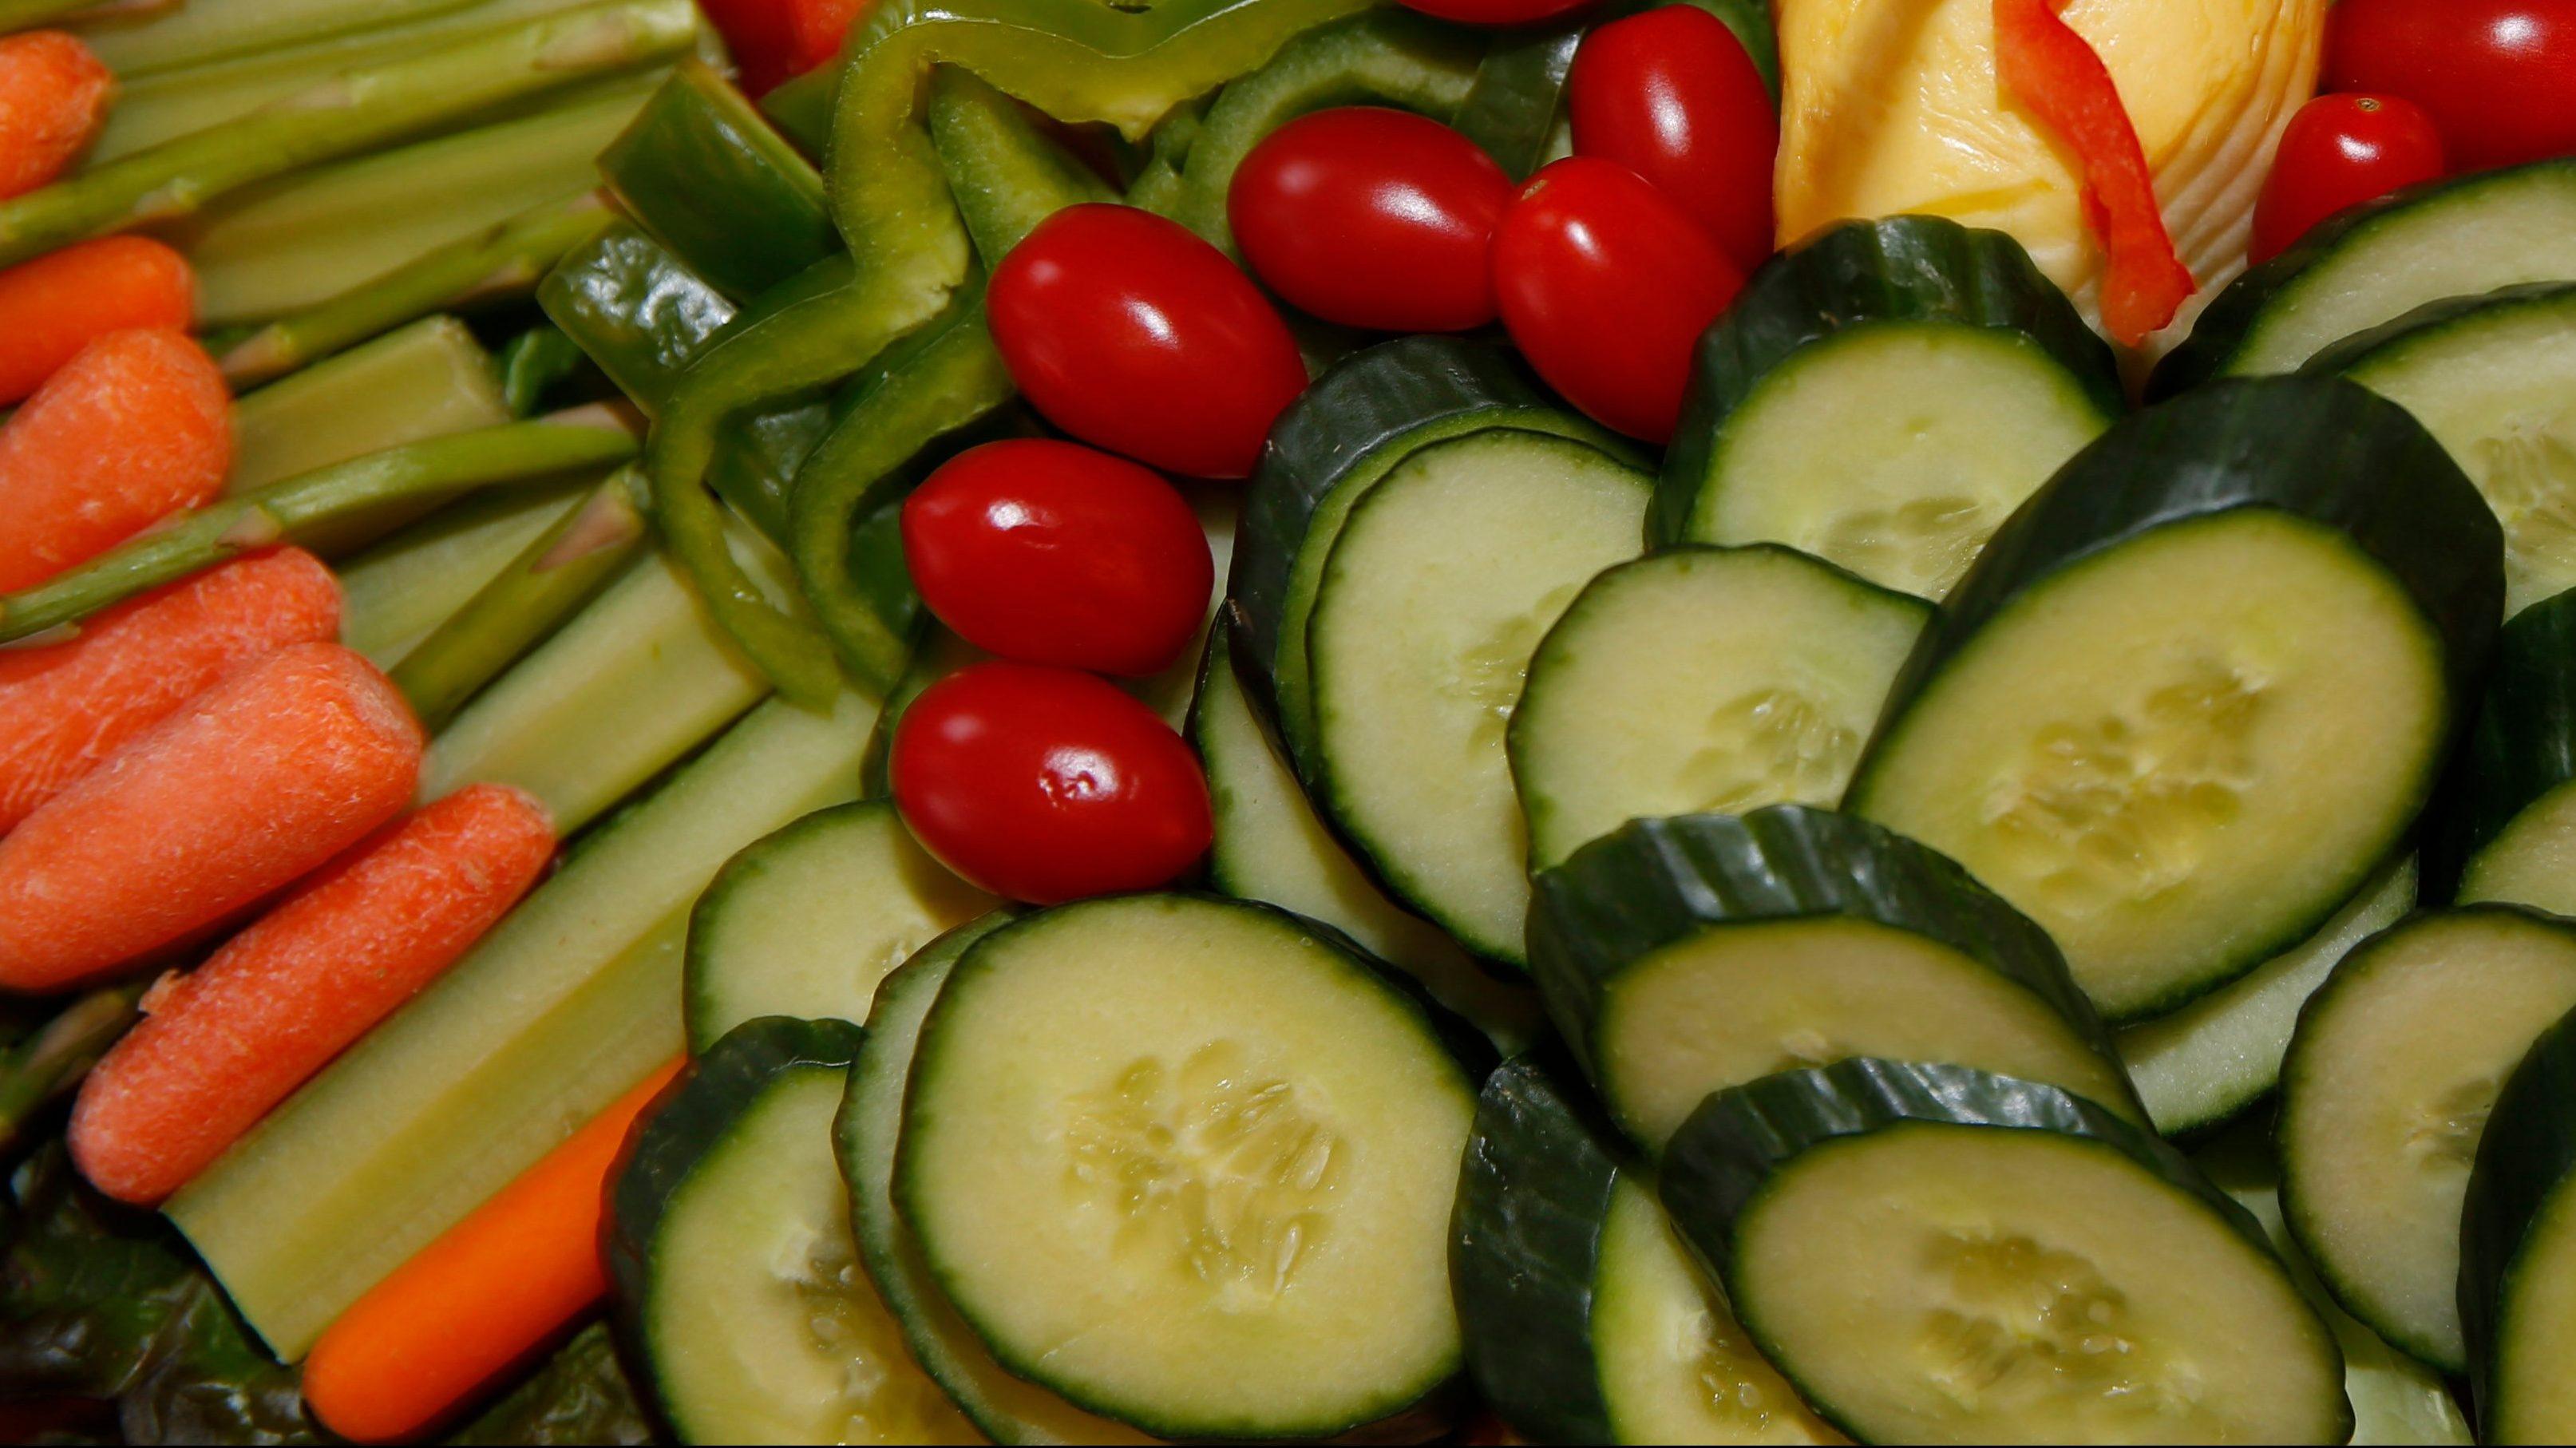 Crunchy Vegetable Videos Are Where Asmr Meets Mukbang Quartz Asmr fried chili + pork rinds + veggies   satisfying crunchy eating sound (no talking). crunchy vegetable videos are where asmr